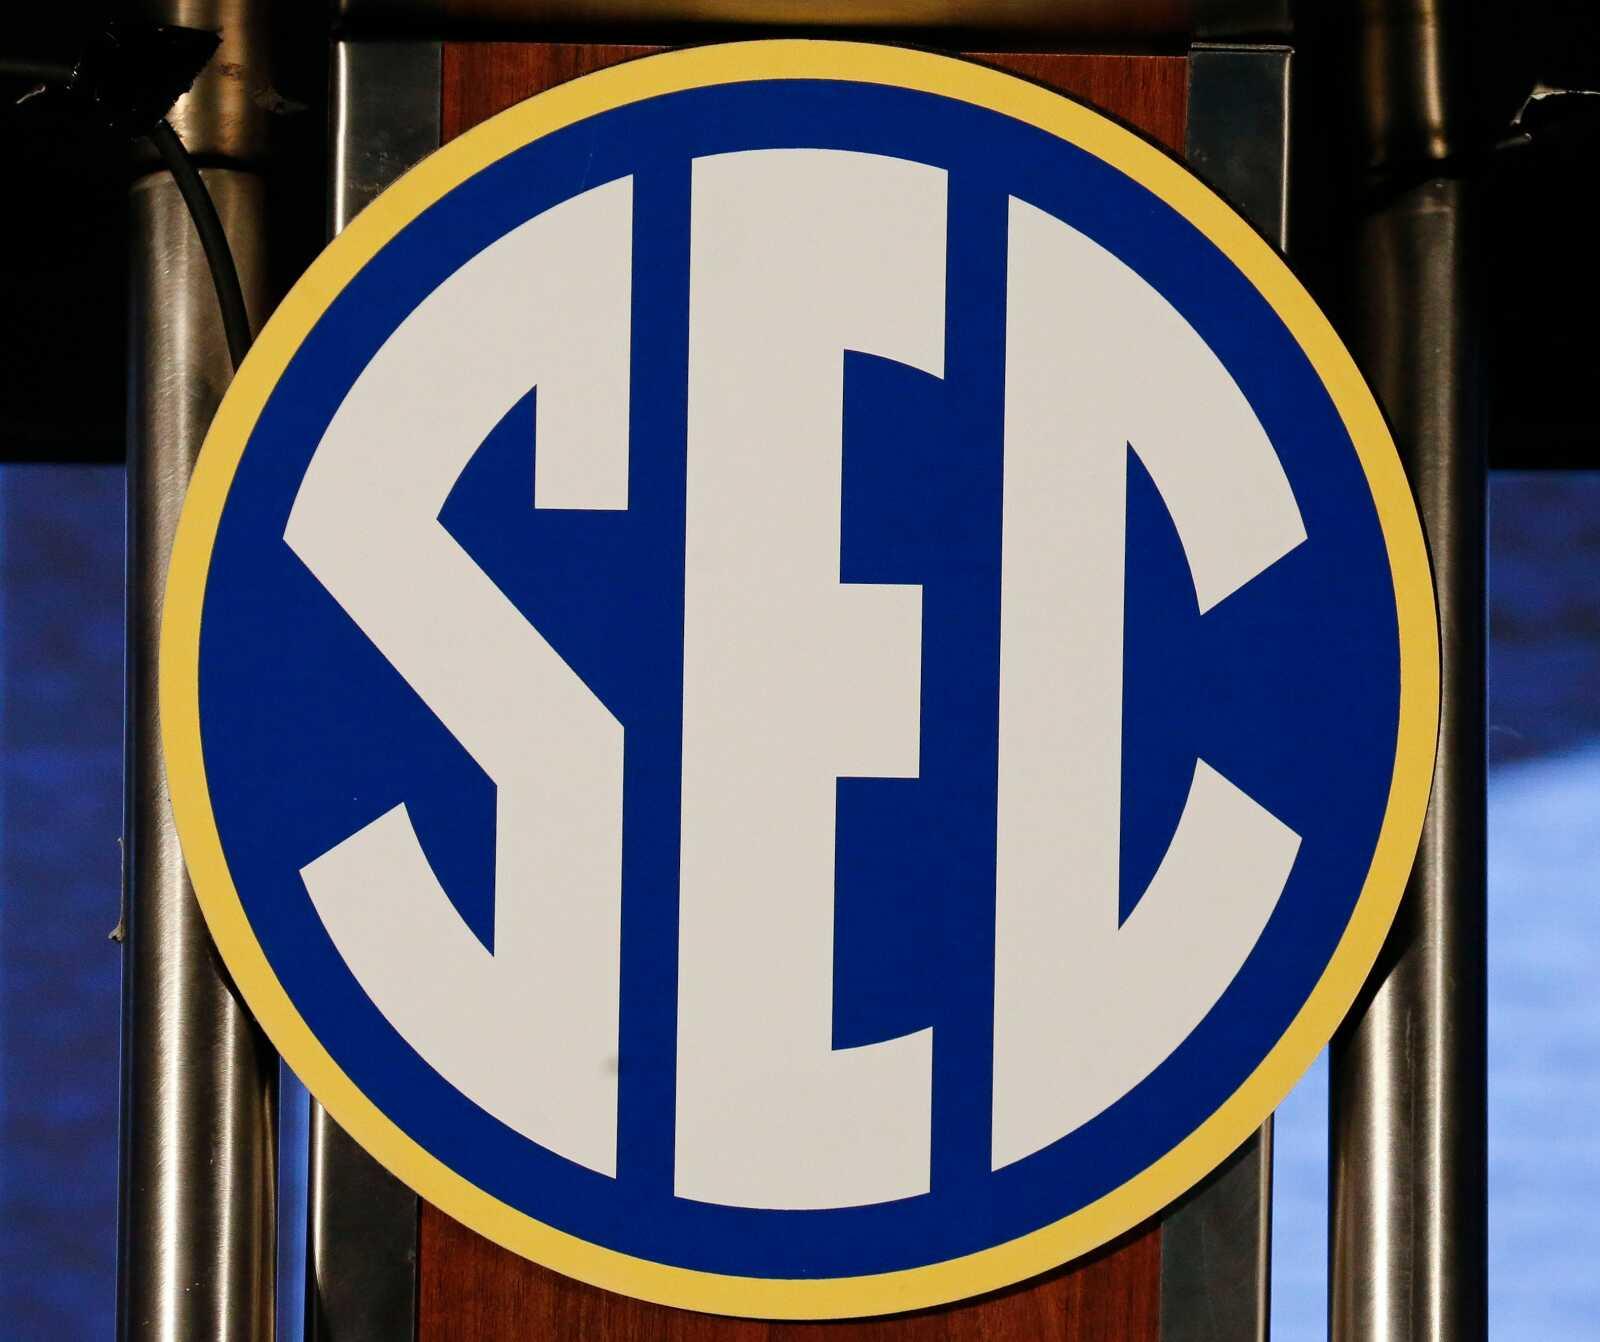 SEC logo seen during SEC Media Days at the Hyatt Regency in Hoover, Ala., Monday, July 19, 2021. [Staff Photo/Gary Cosby Jr.]